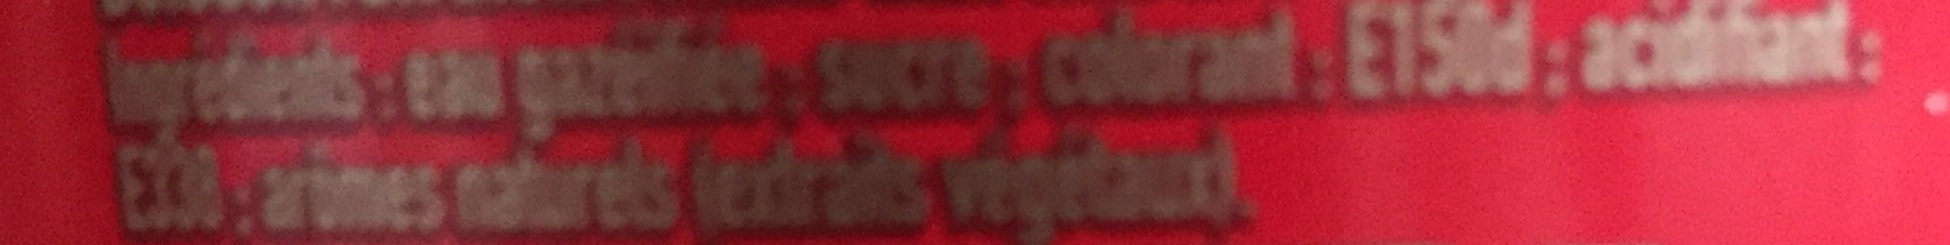 Coca Cola sans caféine - Ingredienti - fr